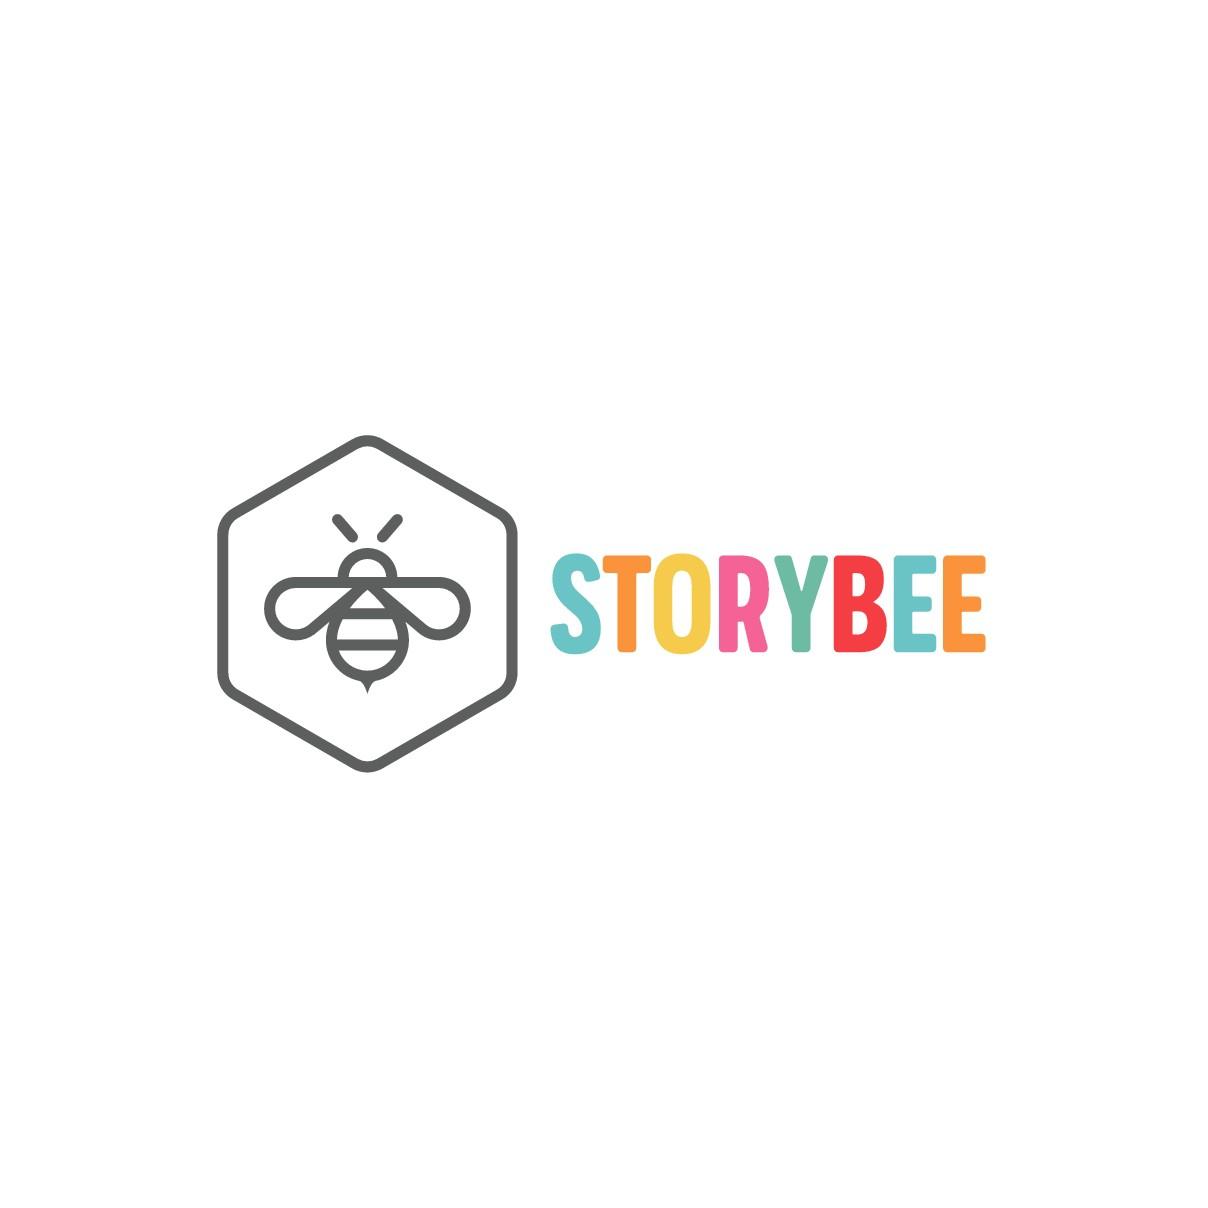 StoryBee